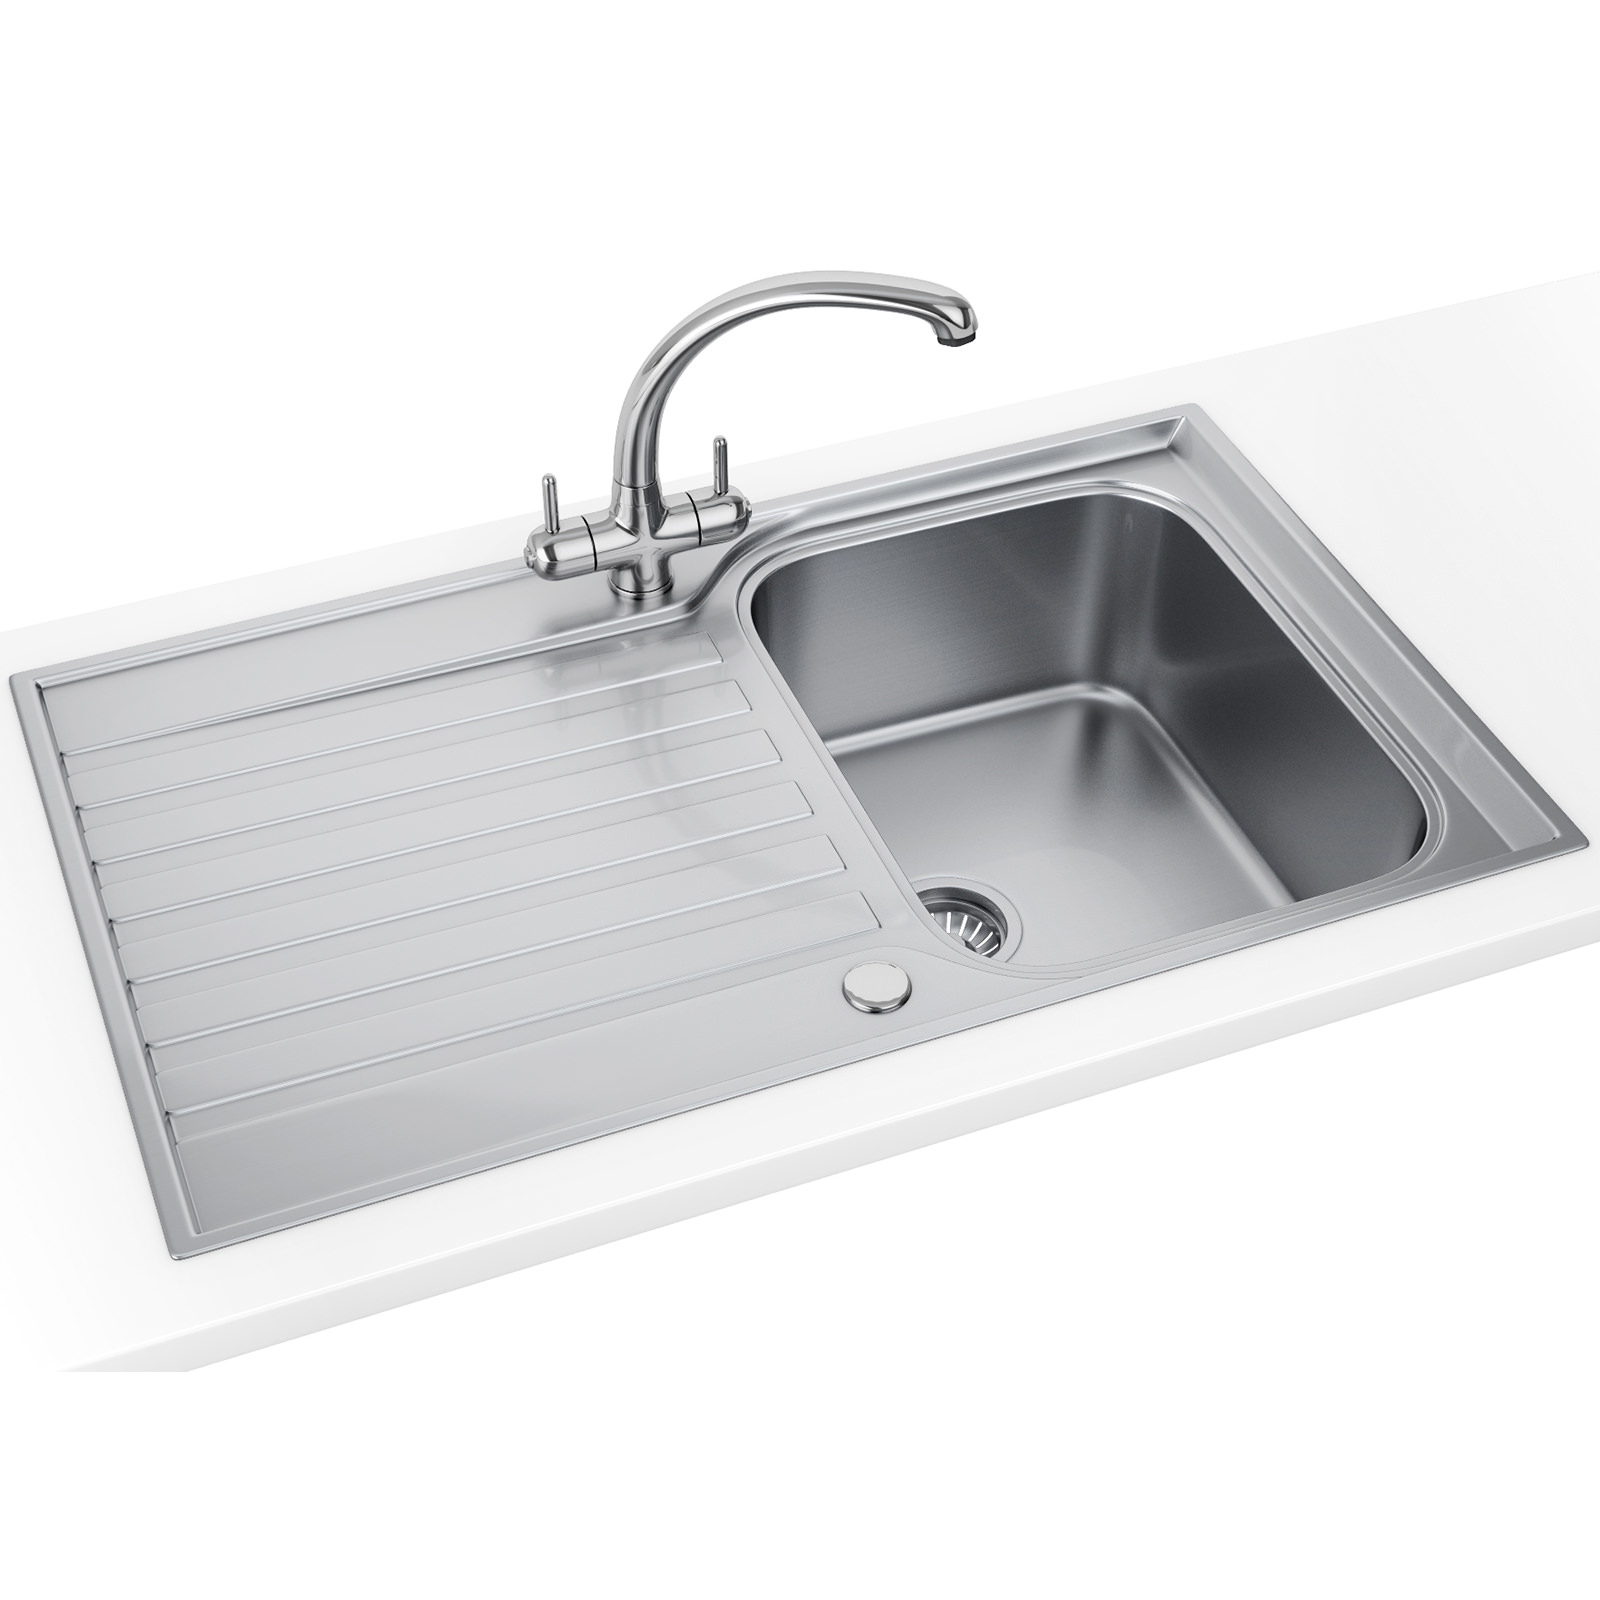 Franke Ascona ASX 611-860 Stainless Steel 1.0 Bowl Inset Sink 101 ...